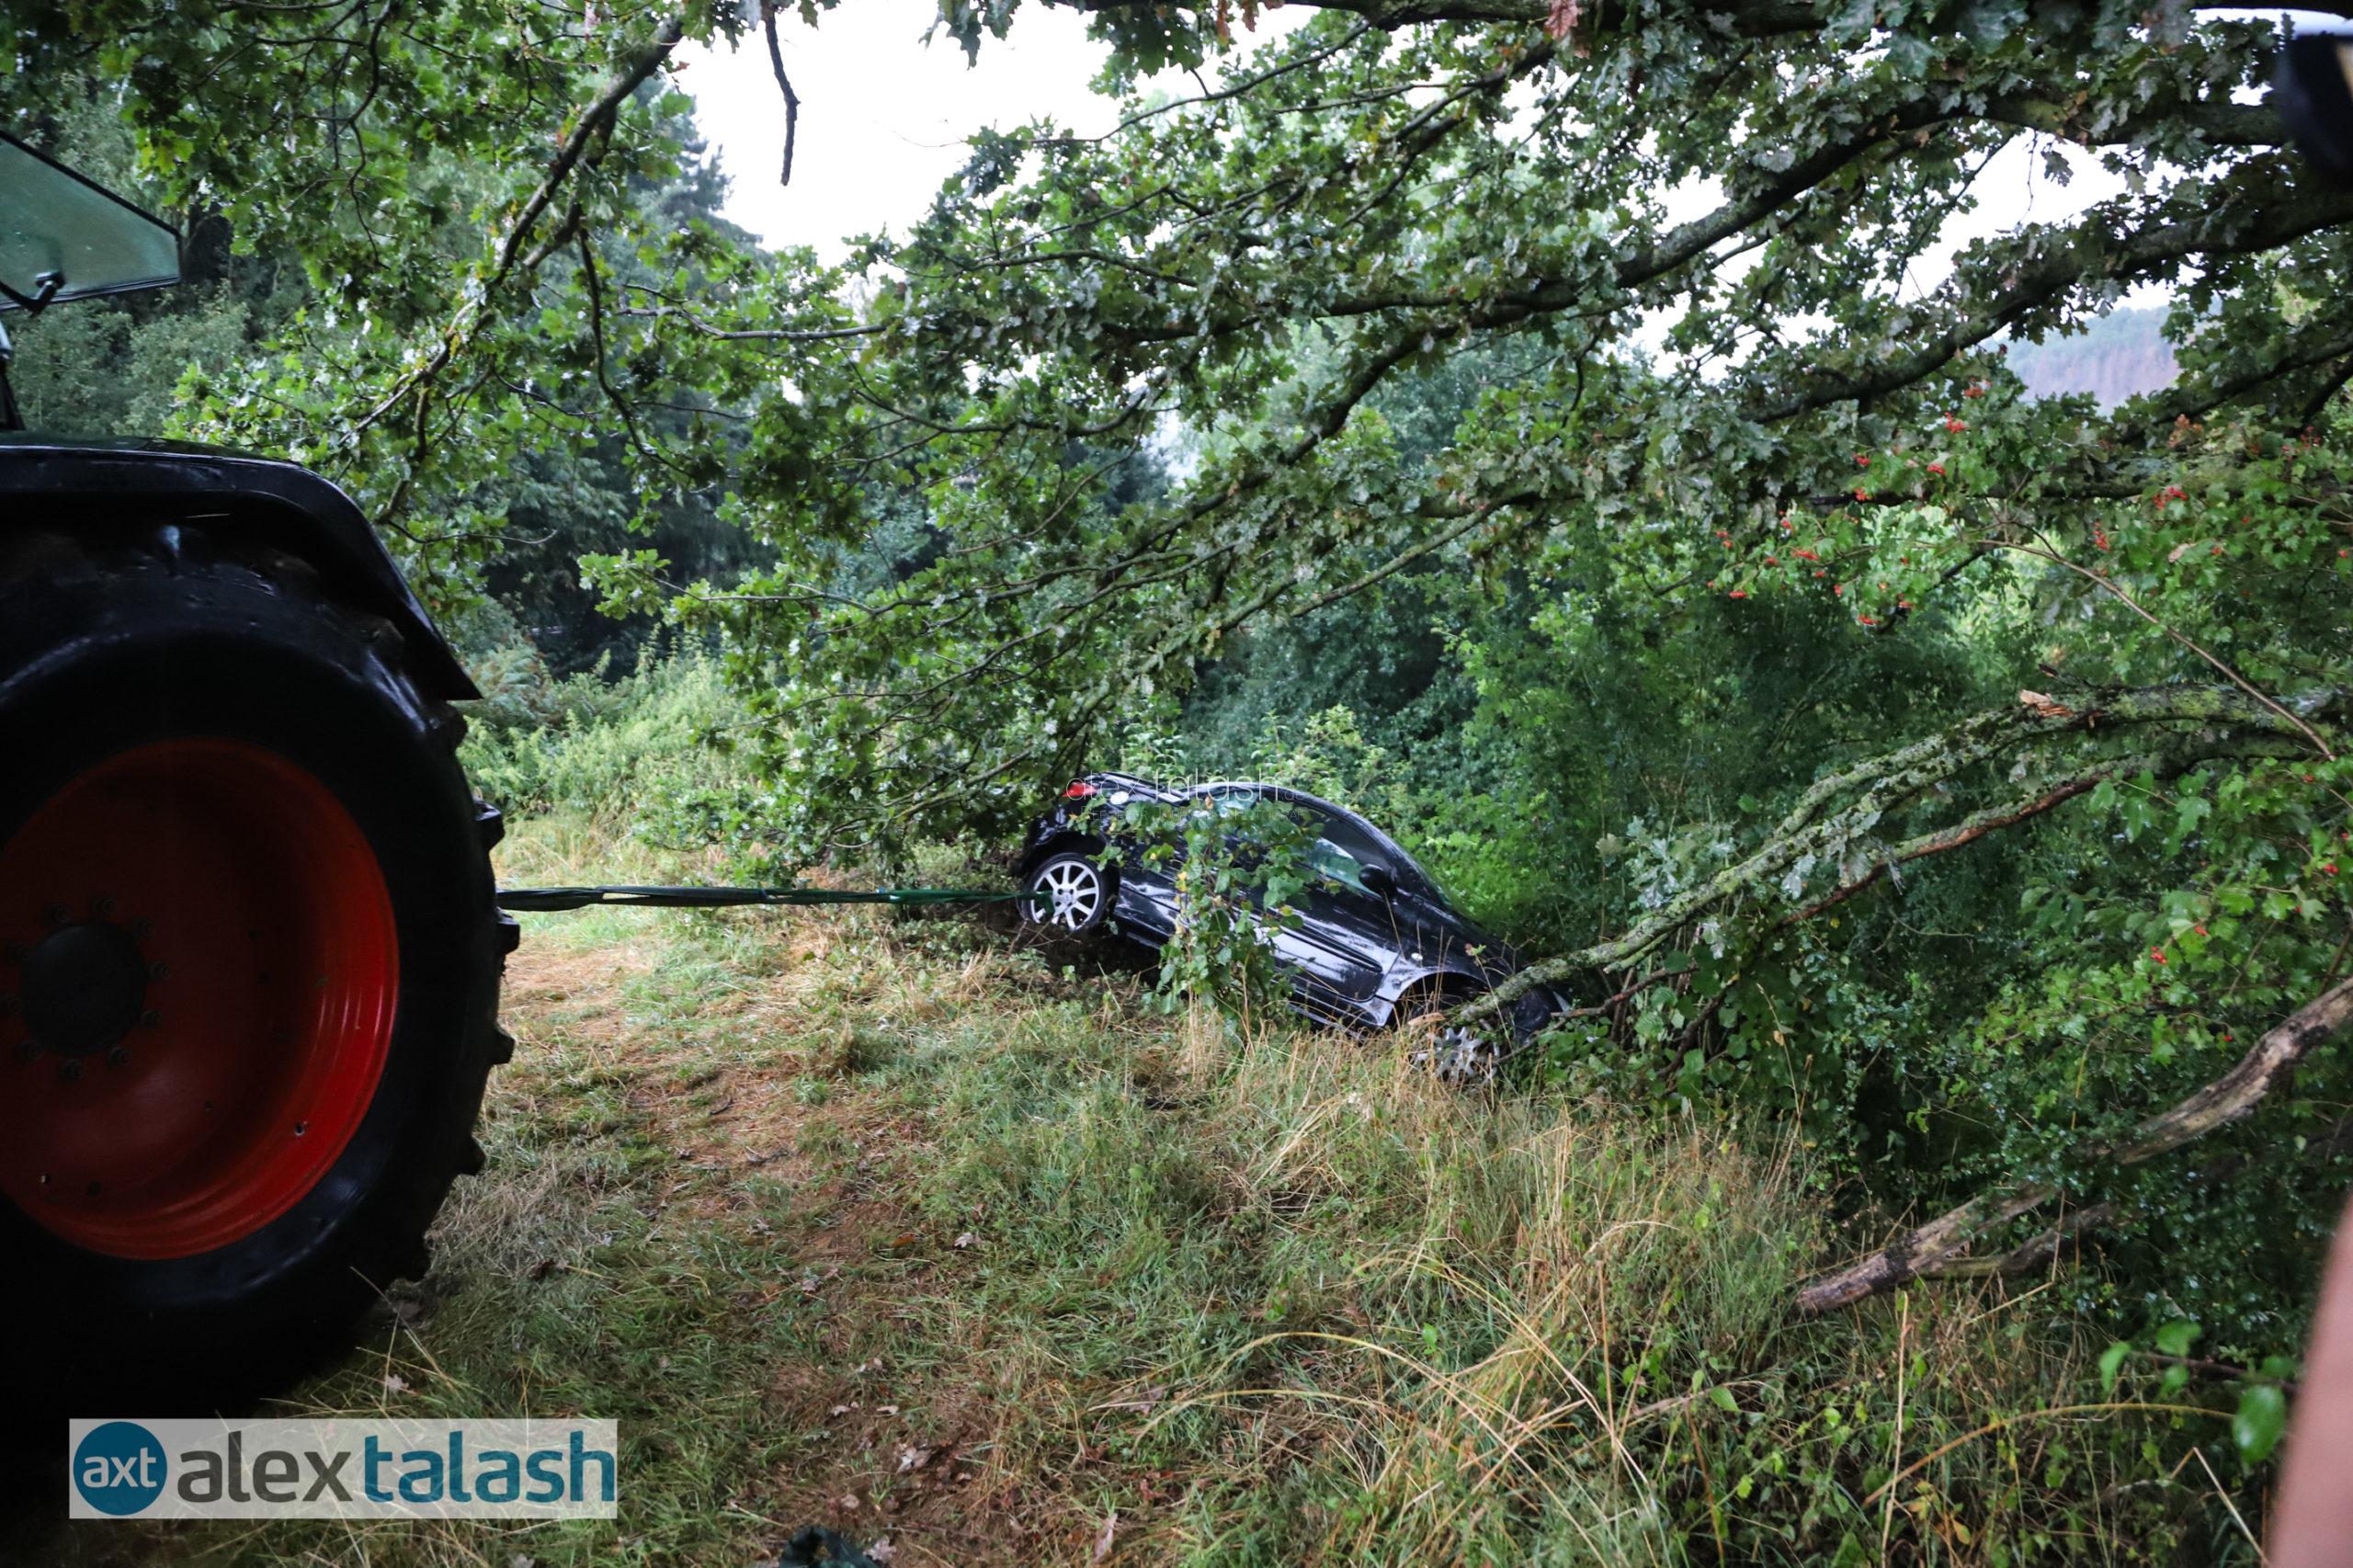 Auto rauscht Hang hinab – Fahrerin flüchtet – Aufwendige Bergung mit Traktor